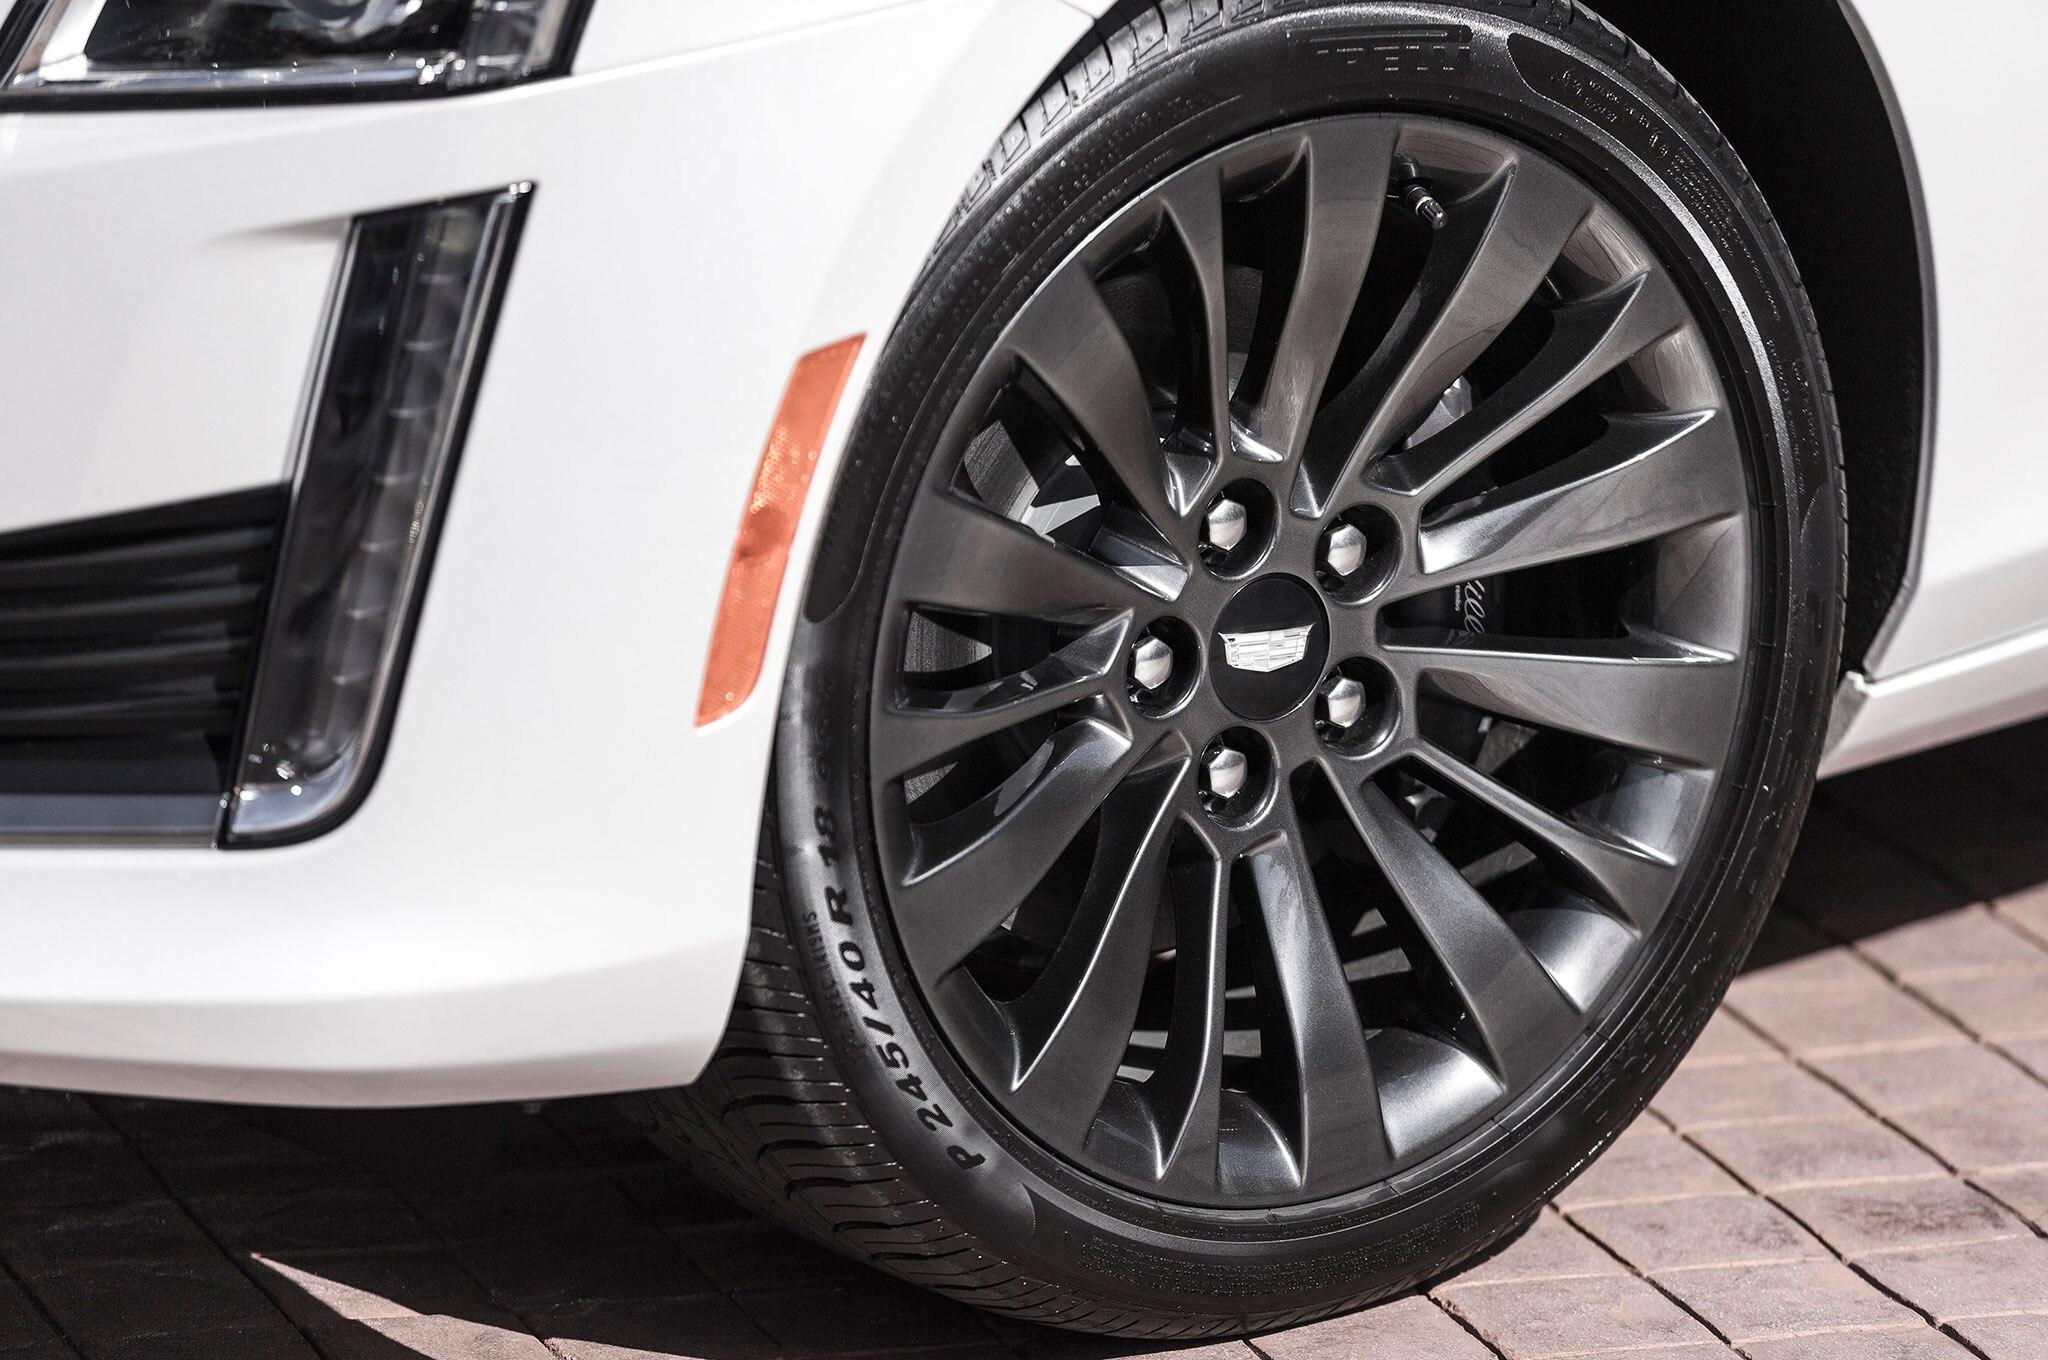 Range Rover Velar Msrp >> 2016 Cadillac CTS, ATS Add New V-6, 8-Speed Auto, Engine ...